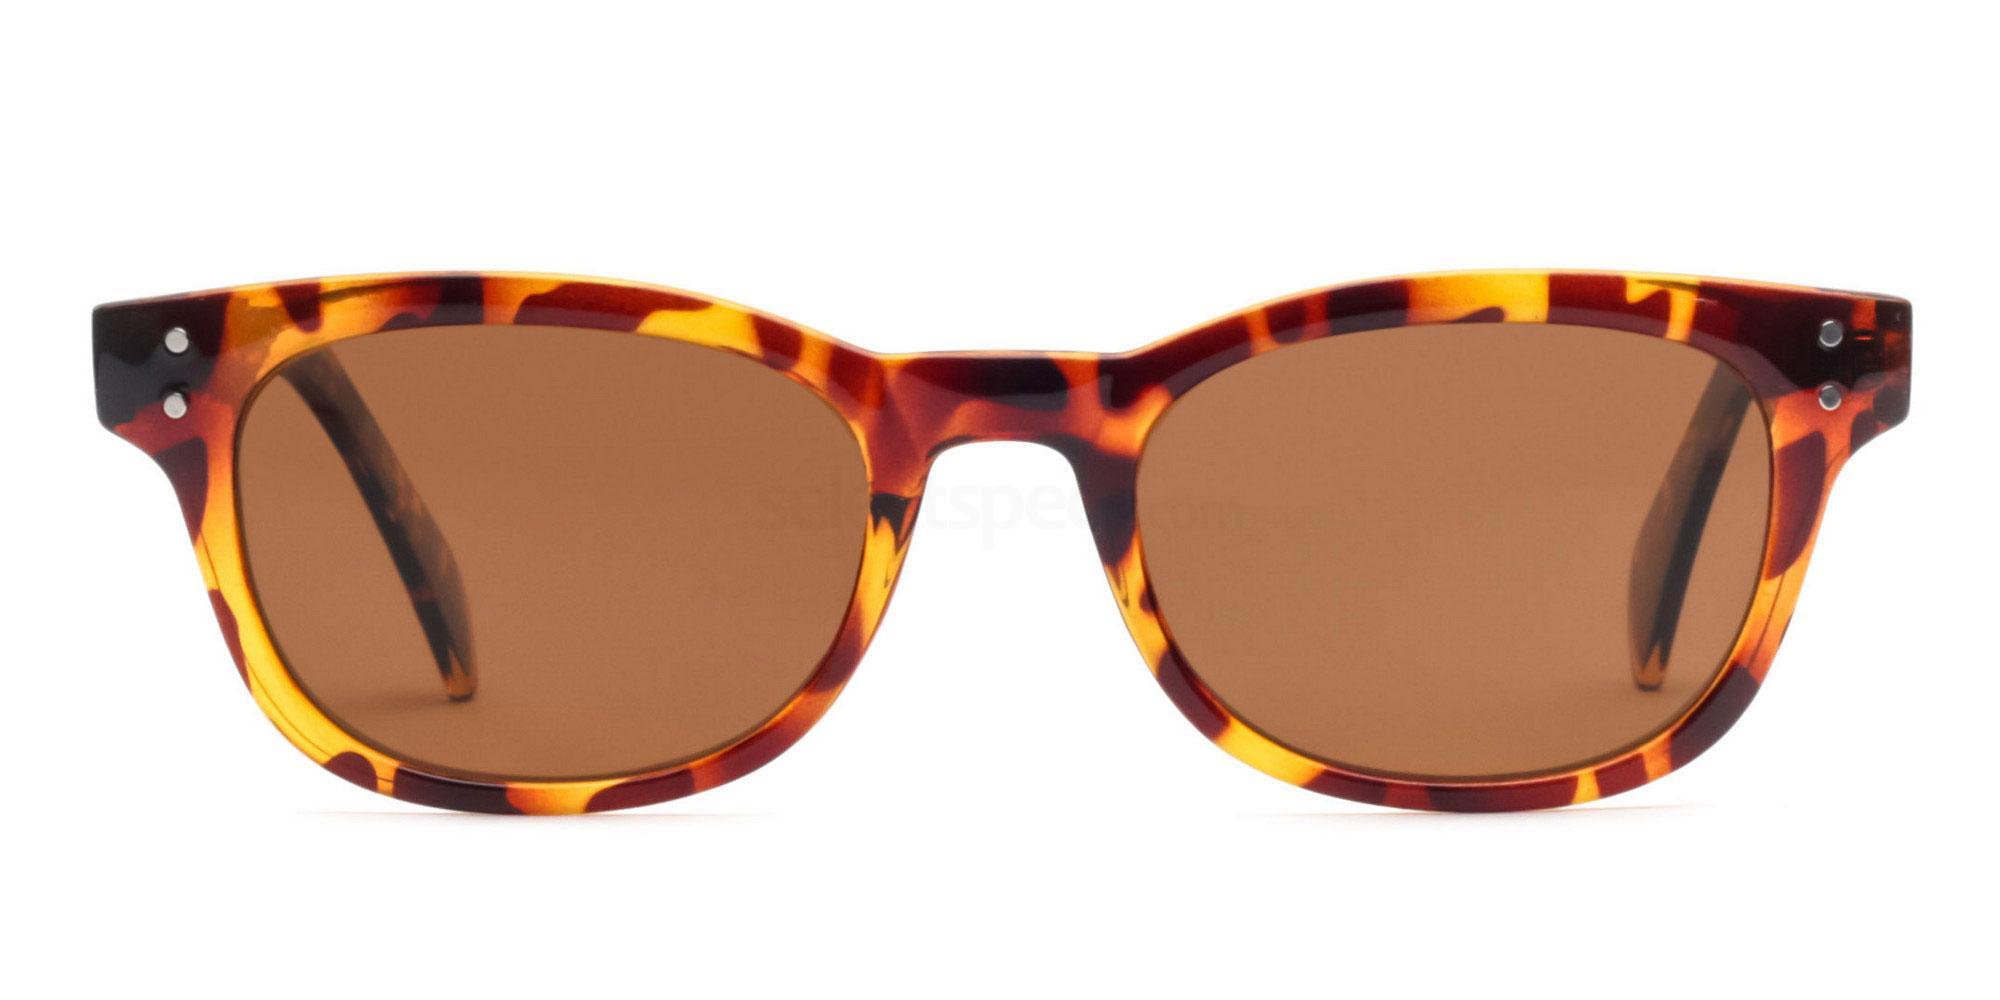 C01 Polarized Brown P2249 Havana (Polarized) Sunglasses, Savannah